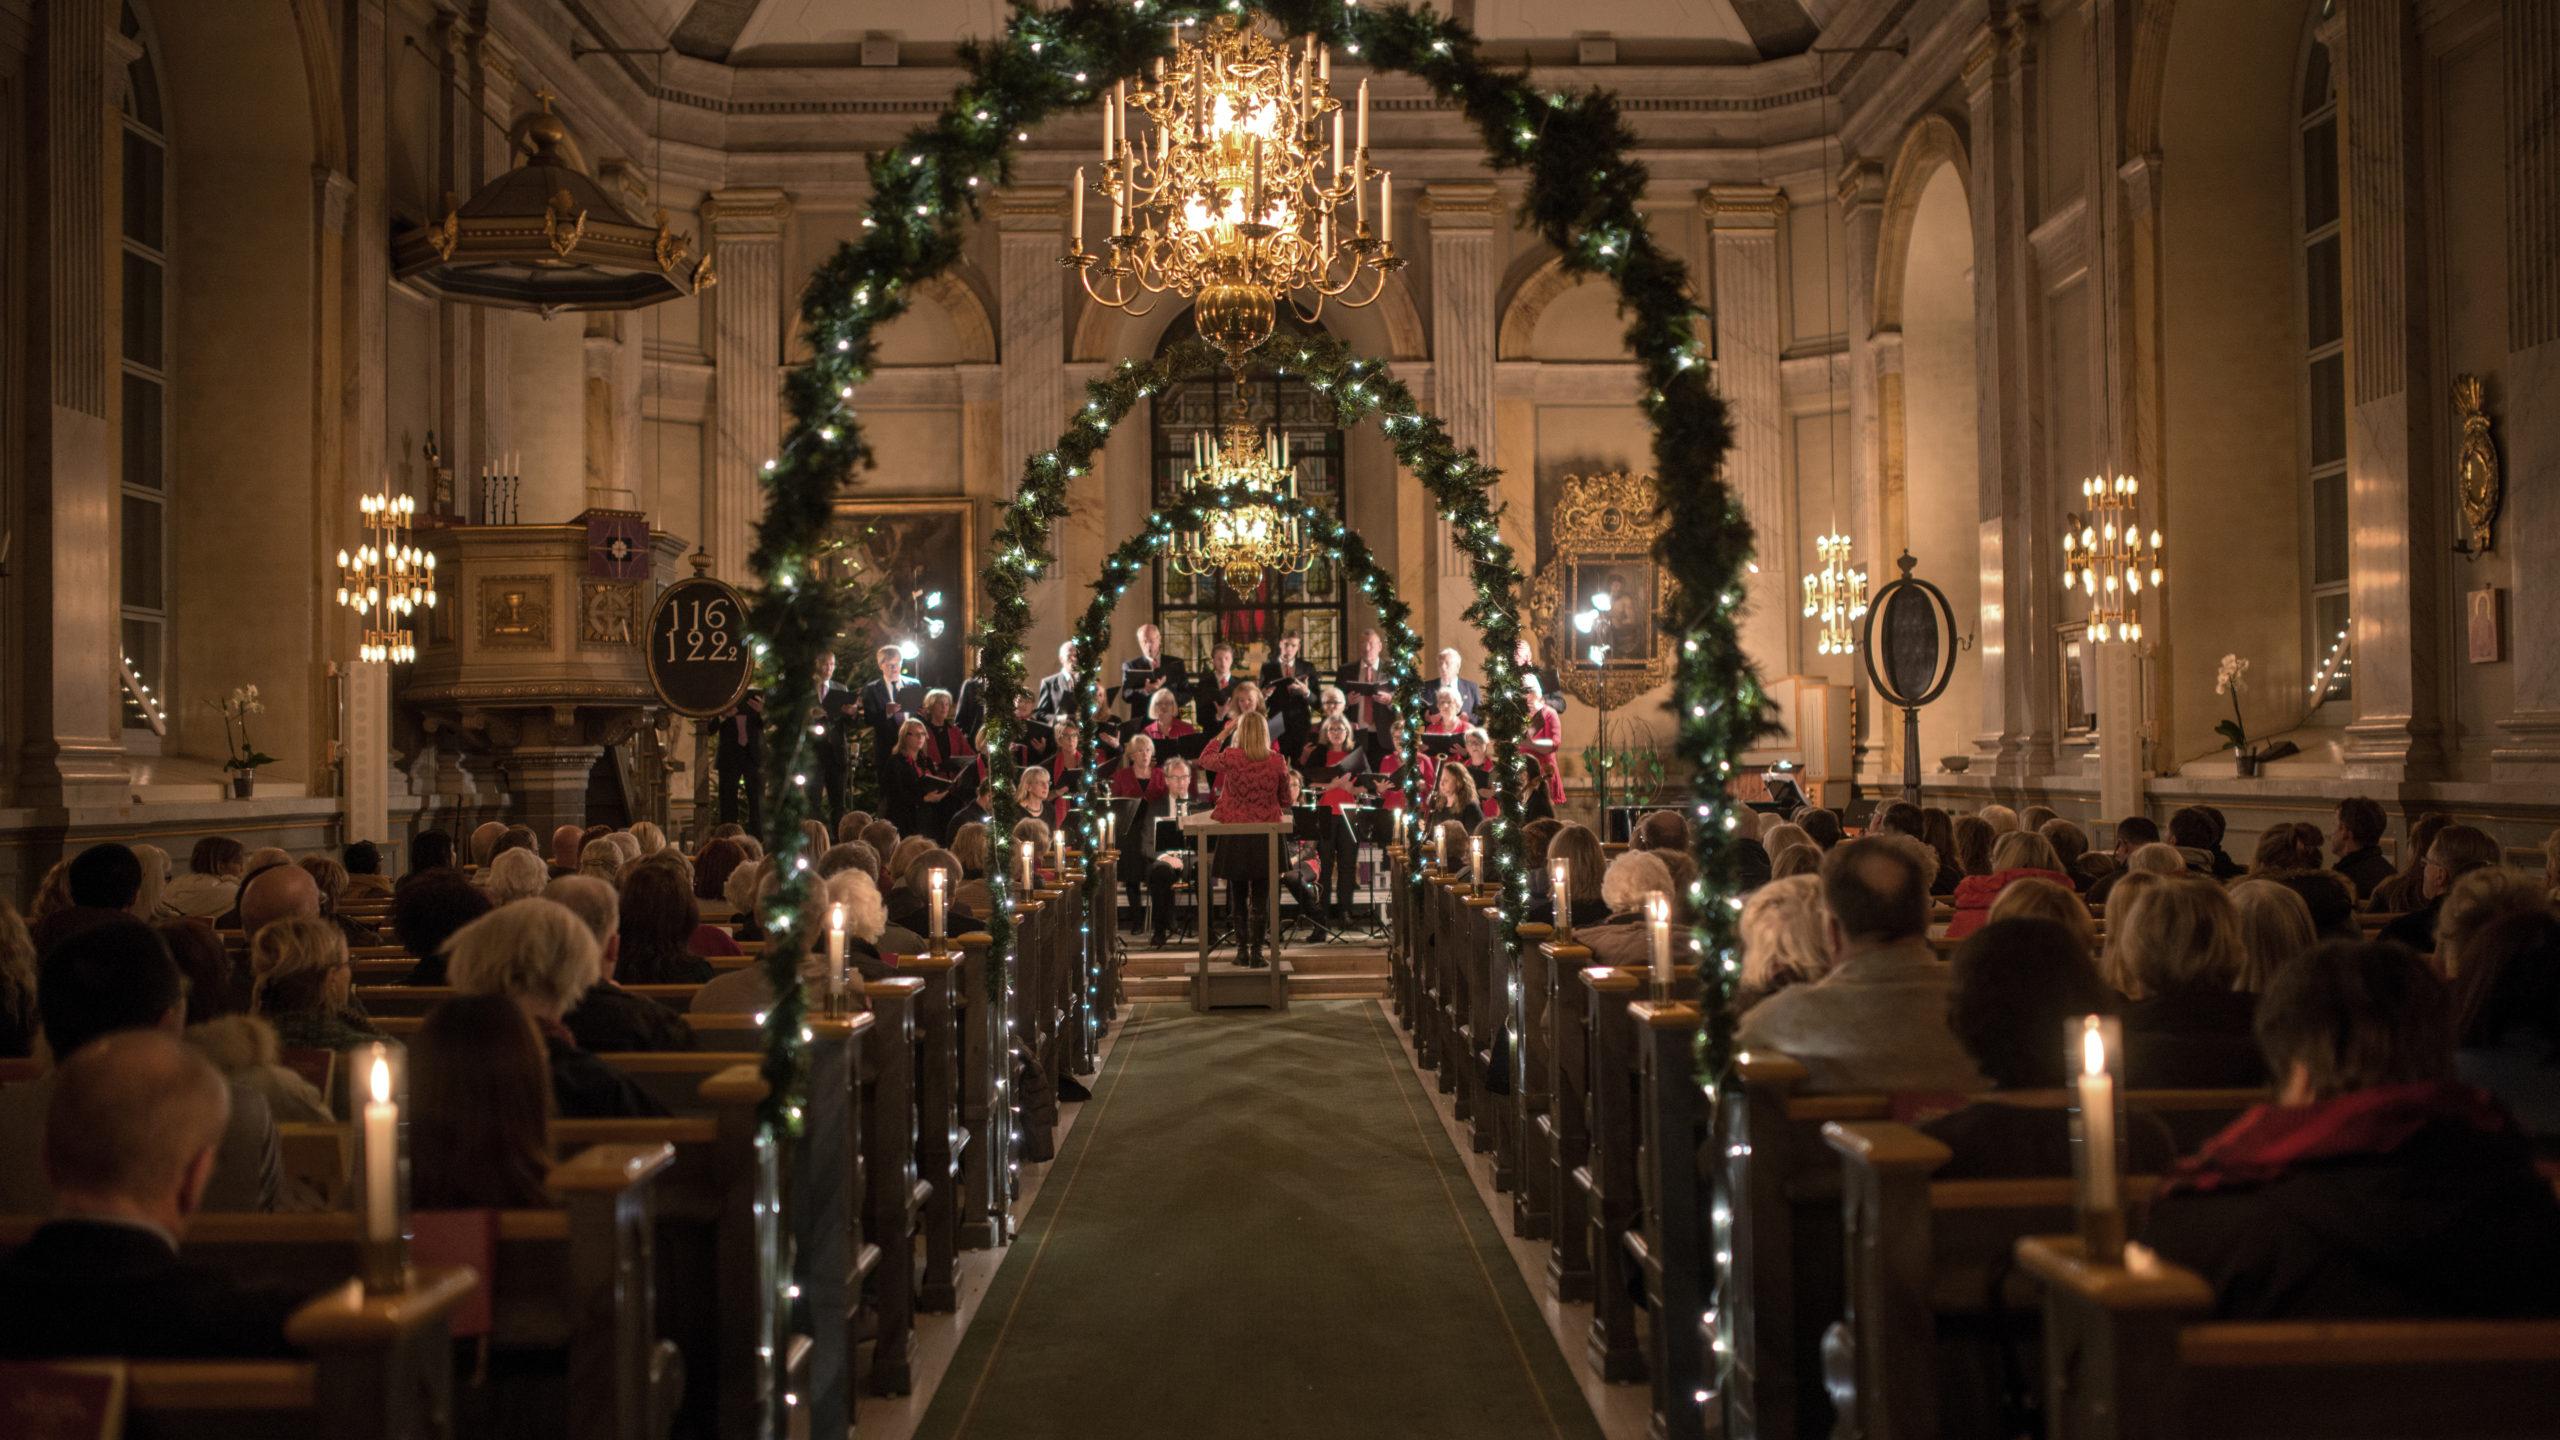 Christmas choir singing in church